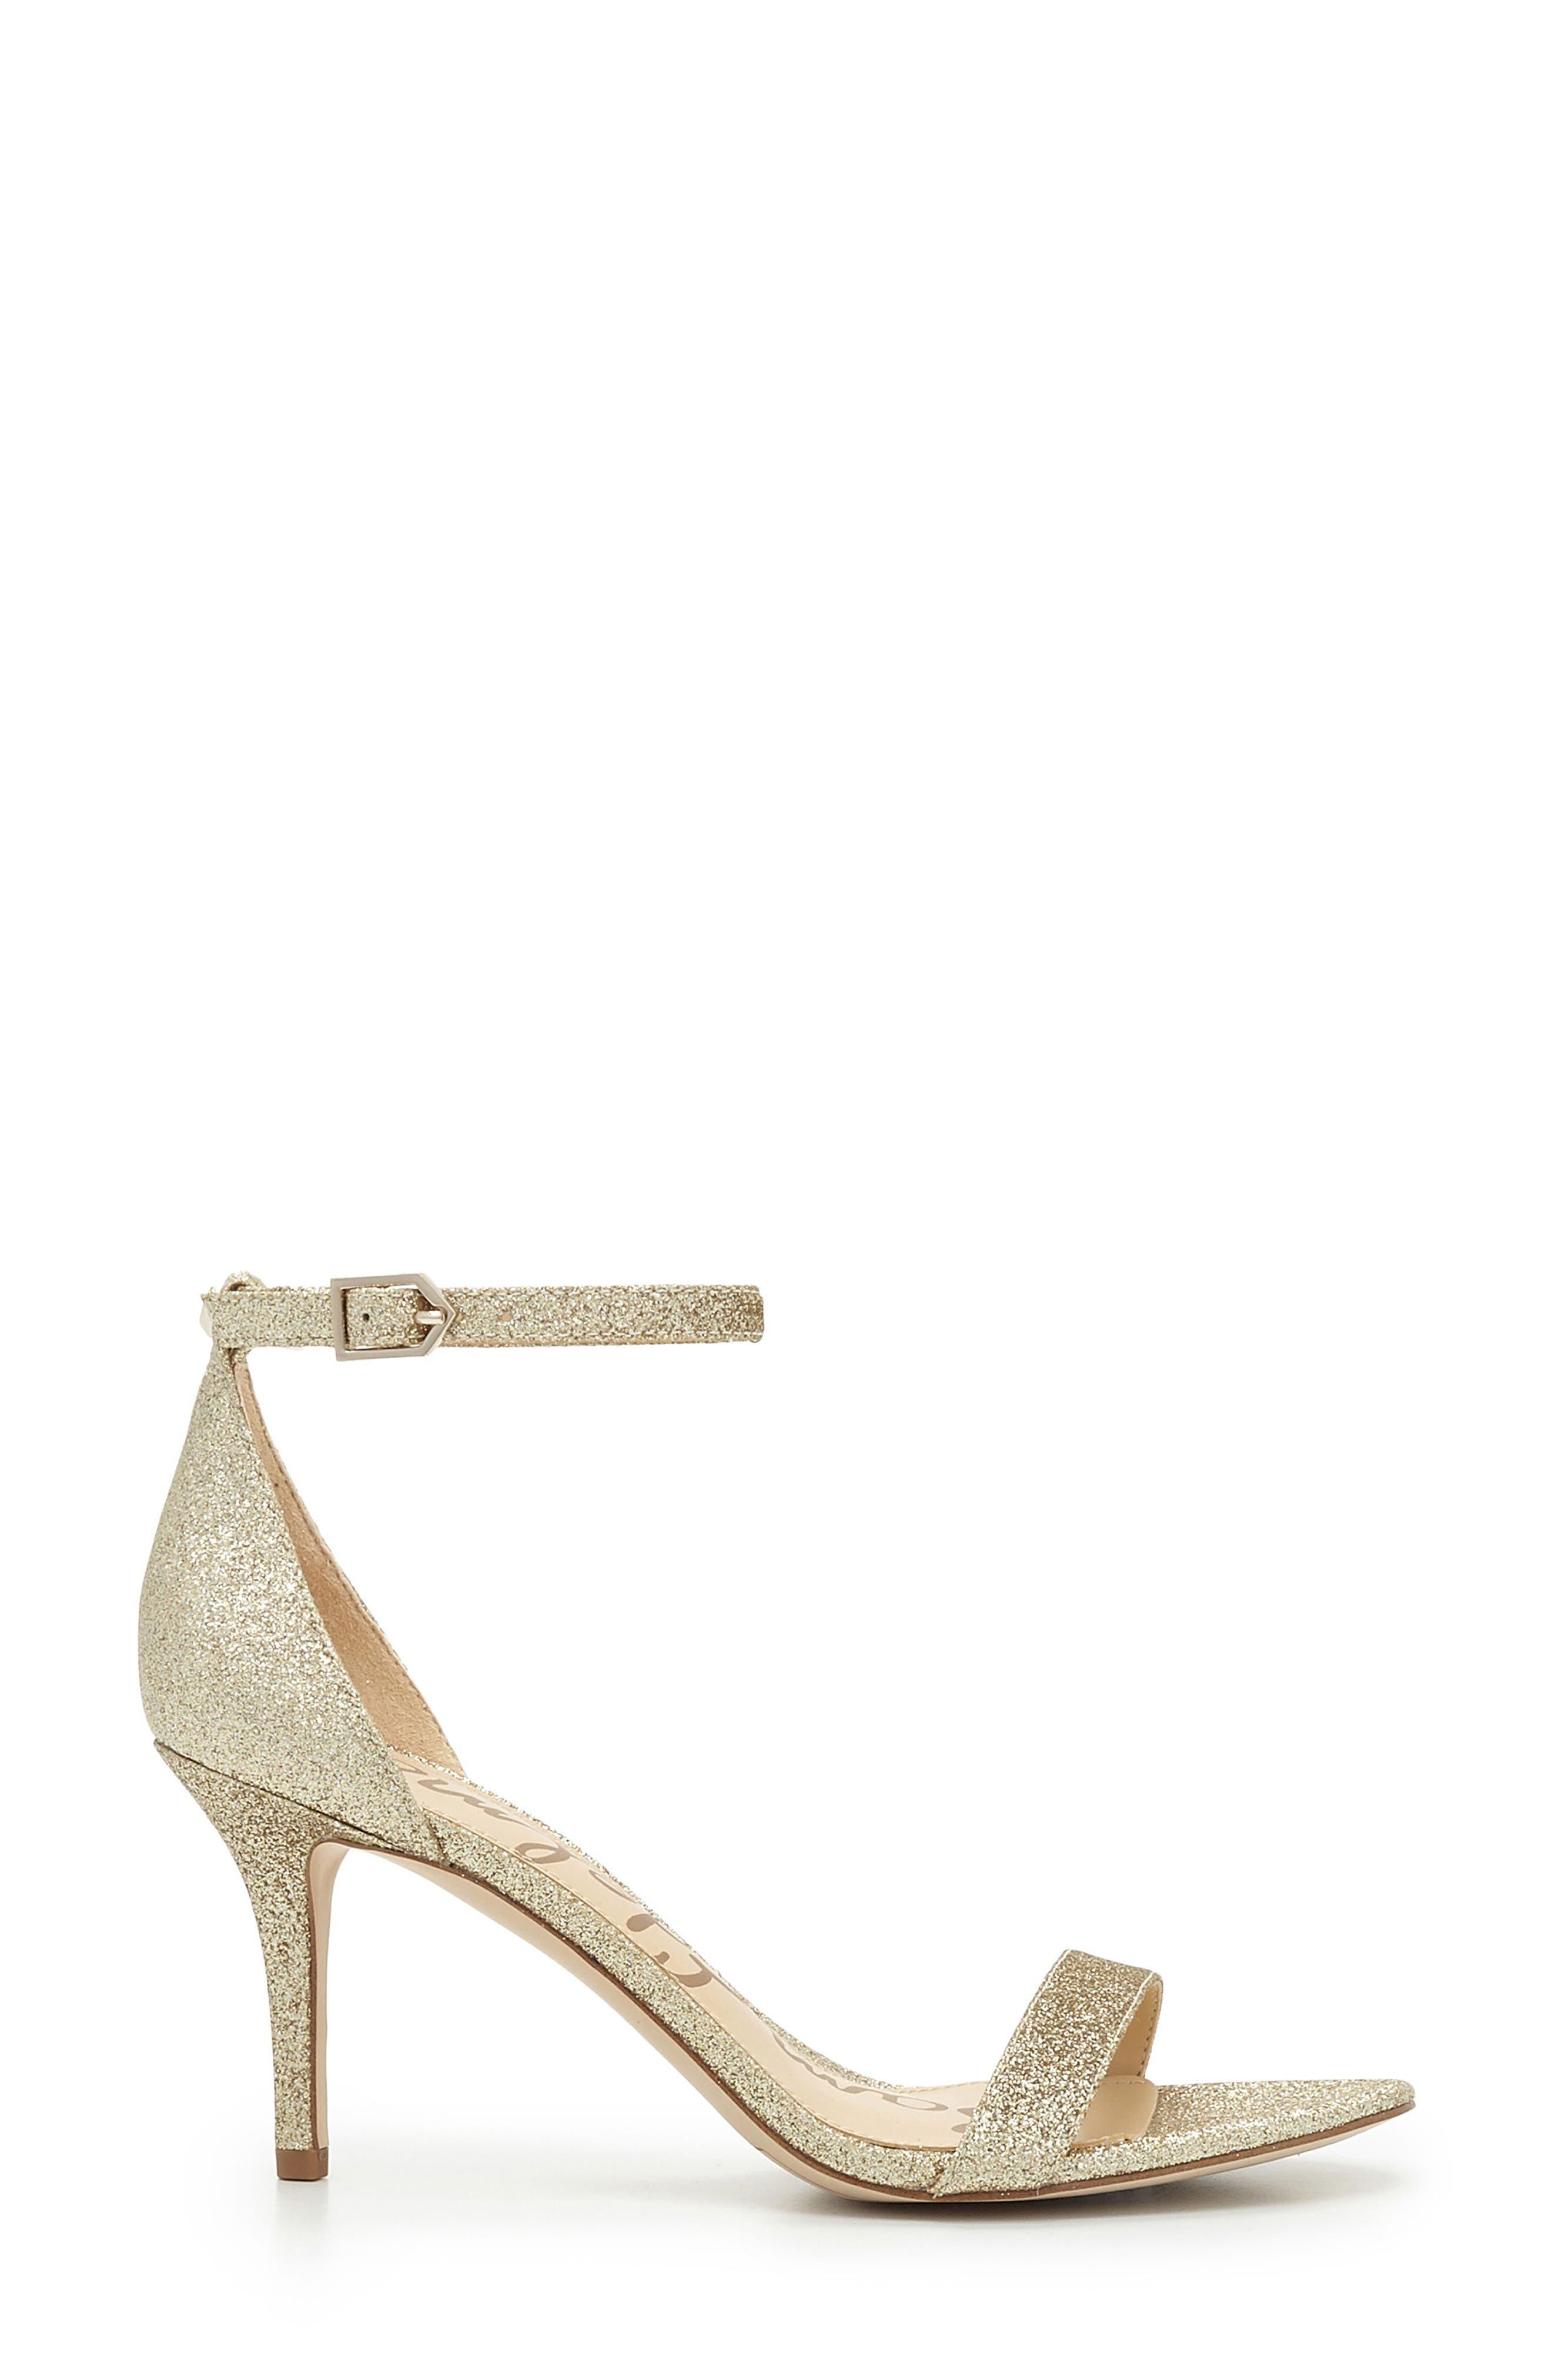 ,                             'Patti' Ankle Strap Sandal,                             Alternate thumbnail 130, color,                             712